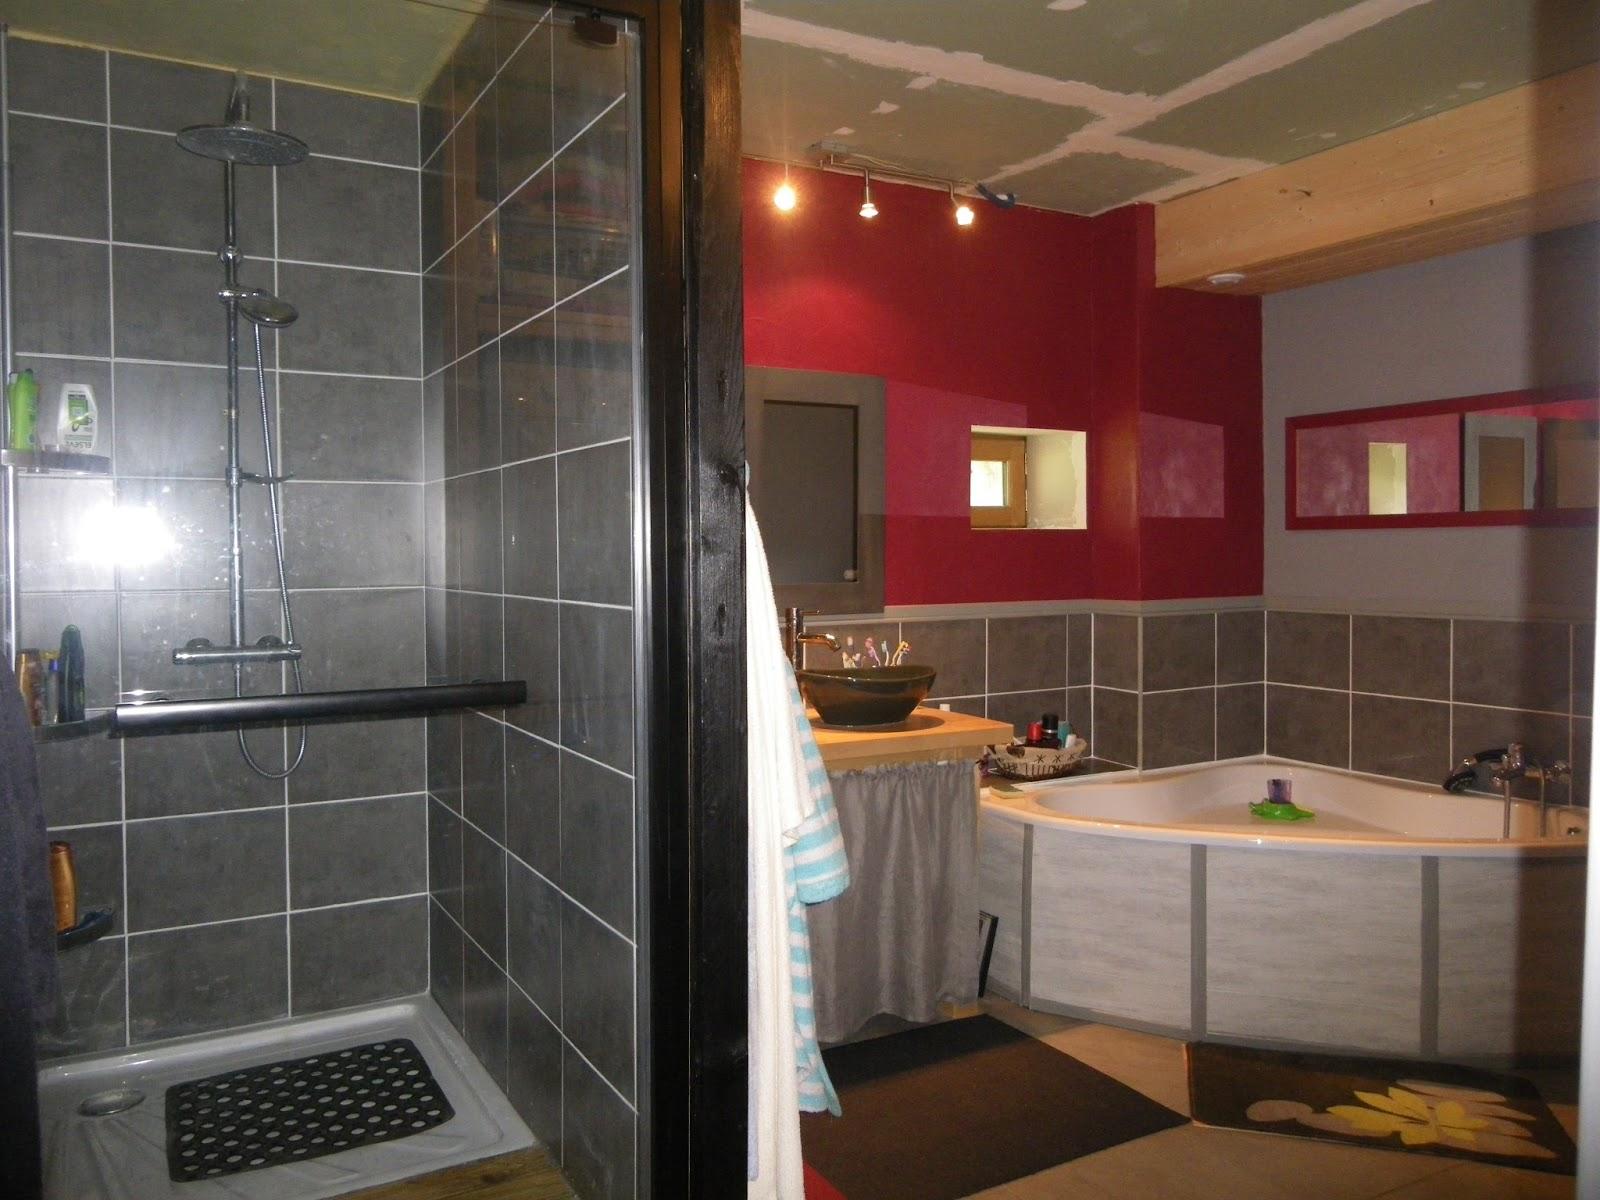 Mes3astucesd co salle de bain avant apr s for Salle de bain avant apres